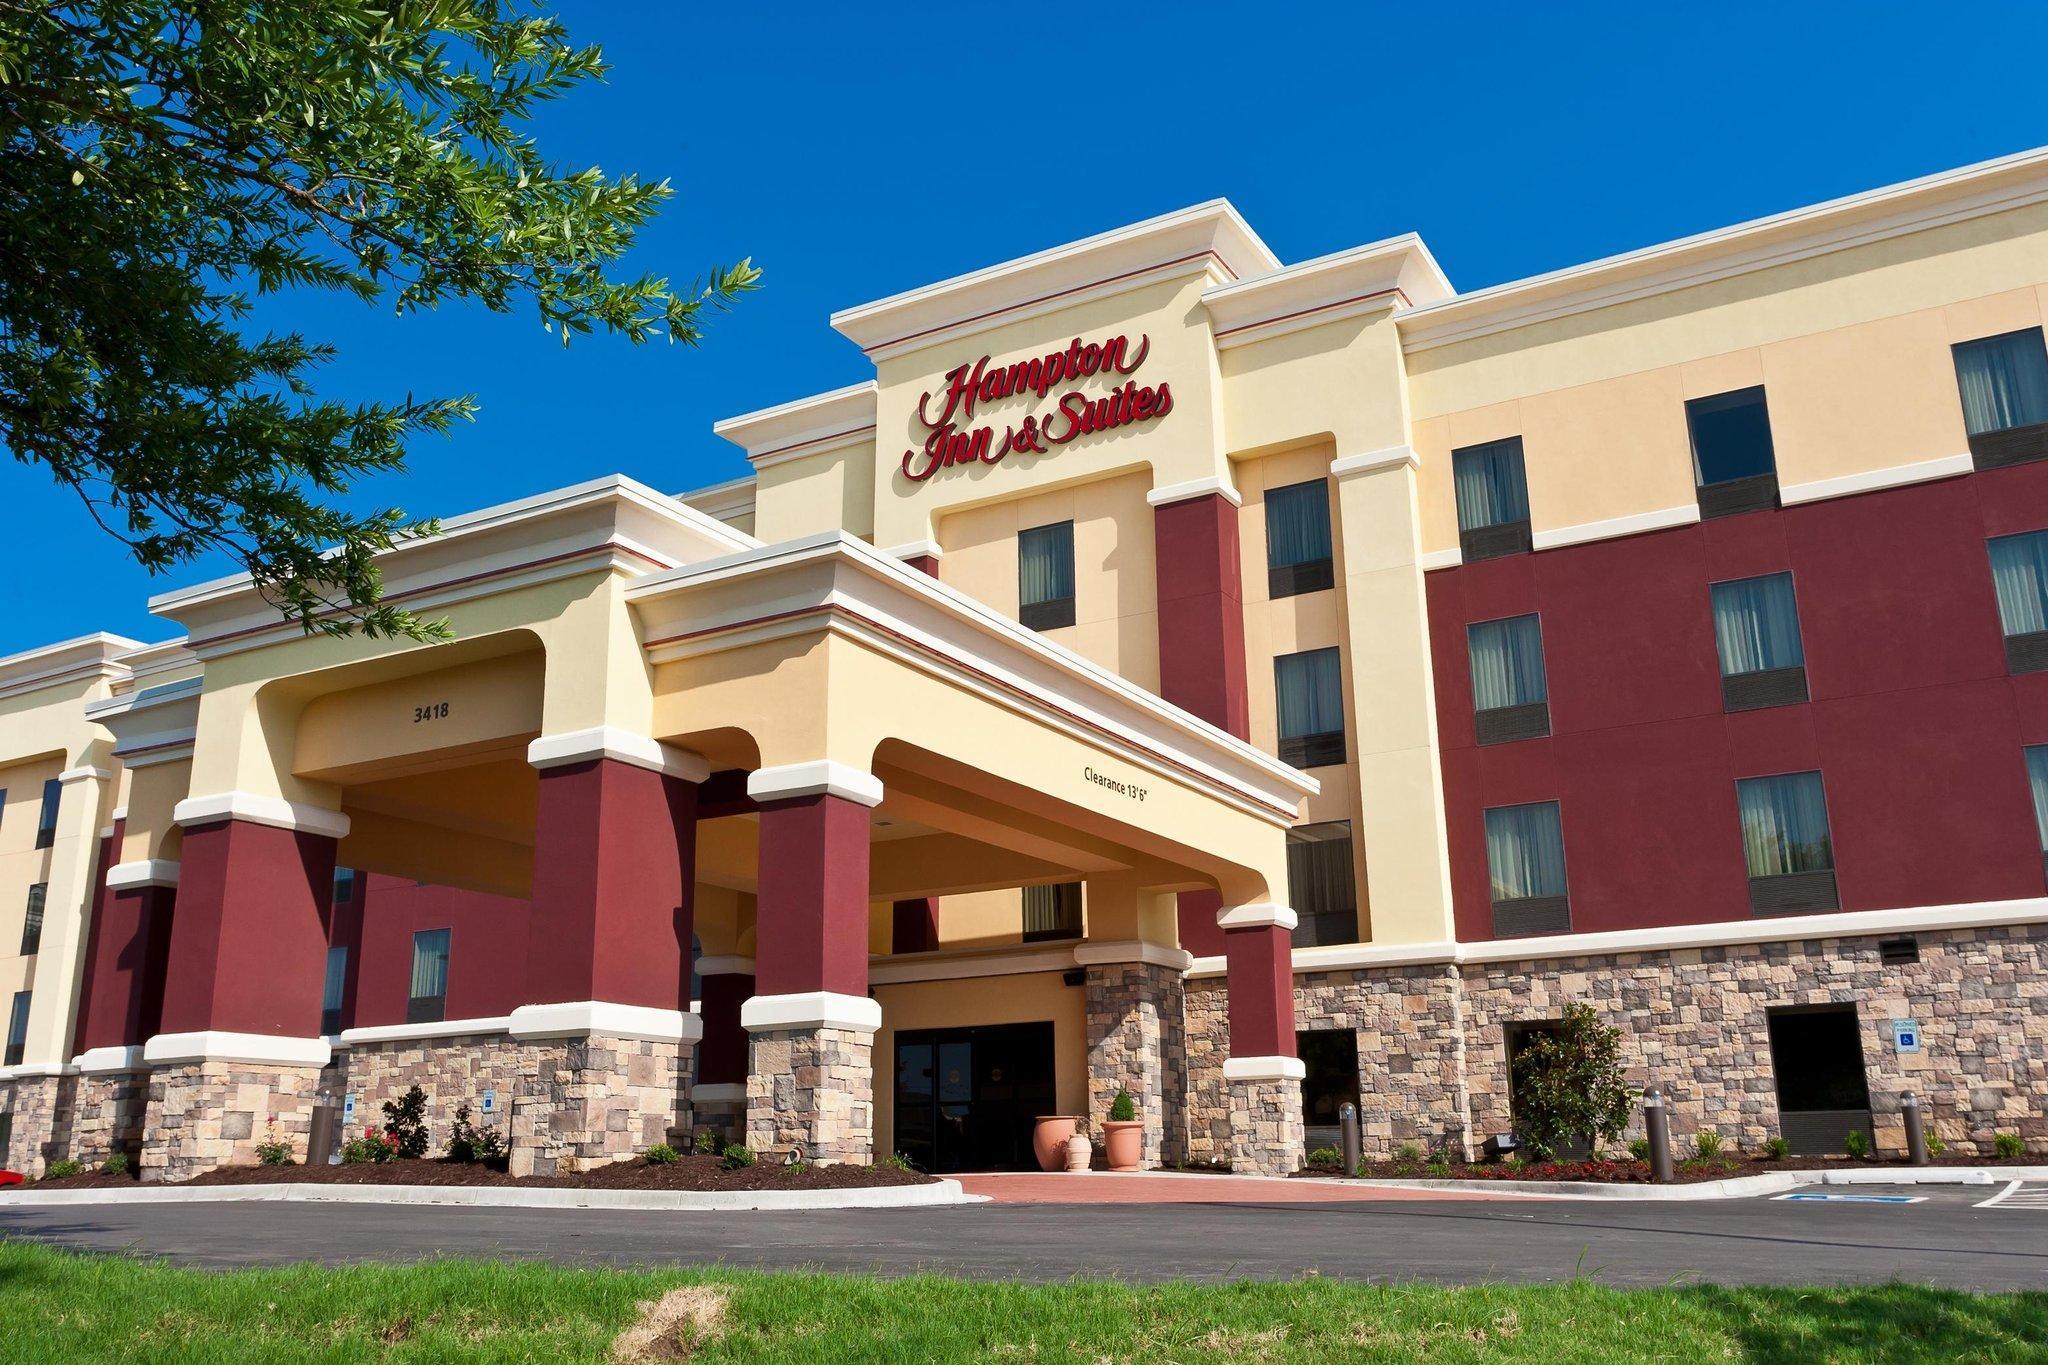 Hampton Inn And Suites Tulsa Central